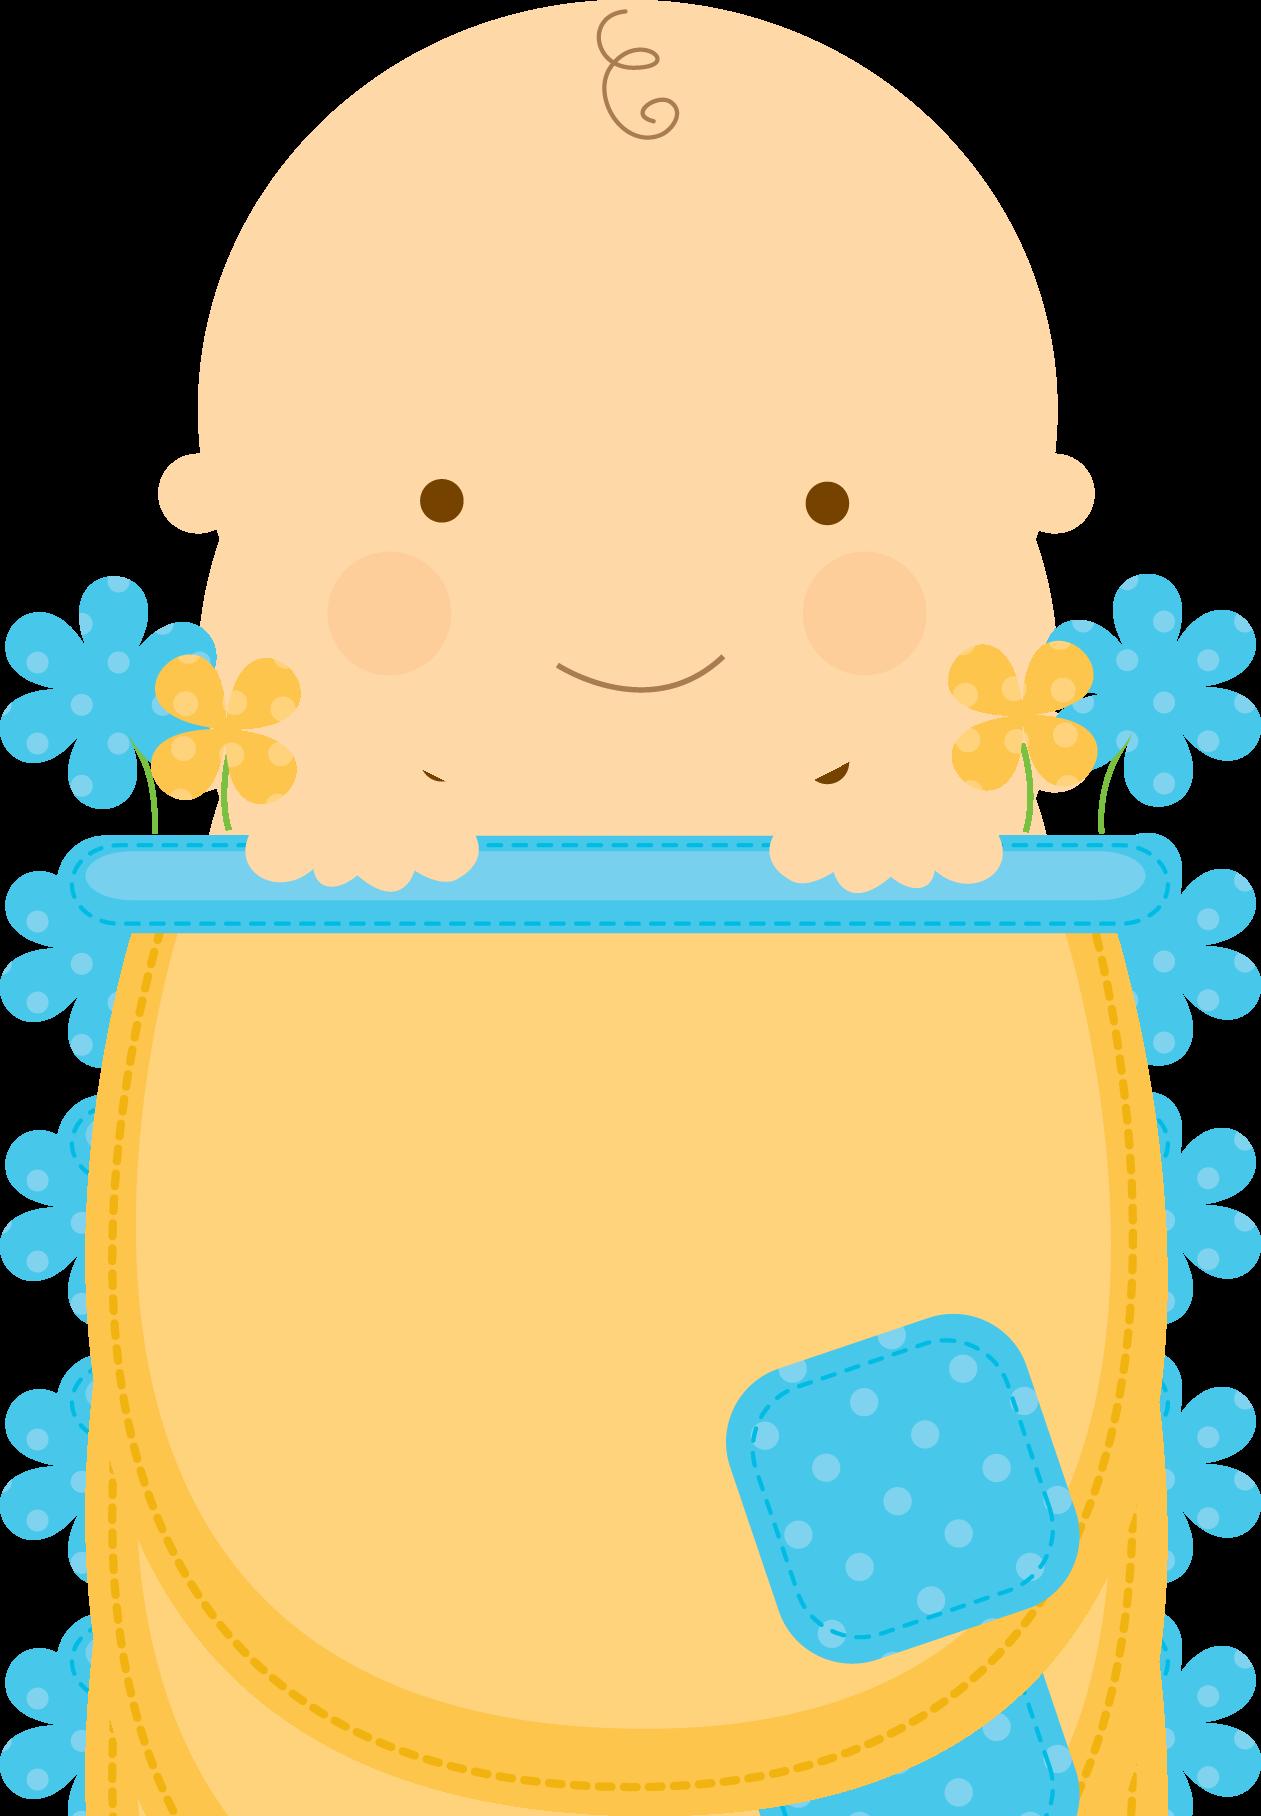 Clipart Babyinflowerpot Boy Png Baby Clip Art Baby Boy Scrapbook Baby Shower Clipart